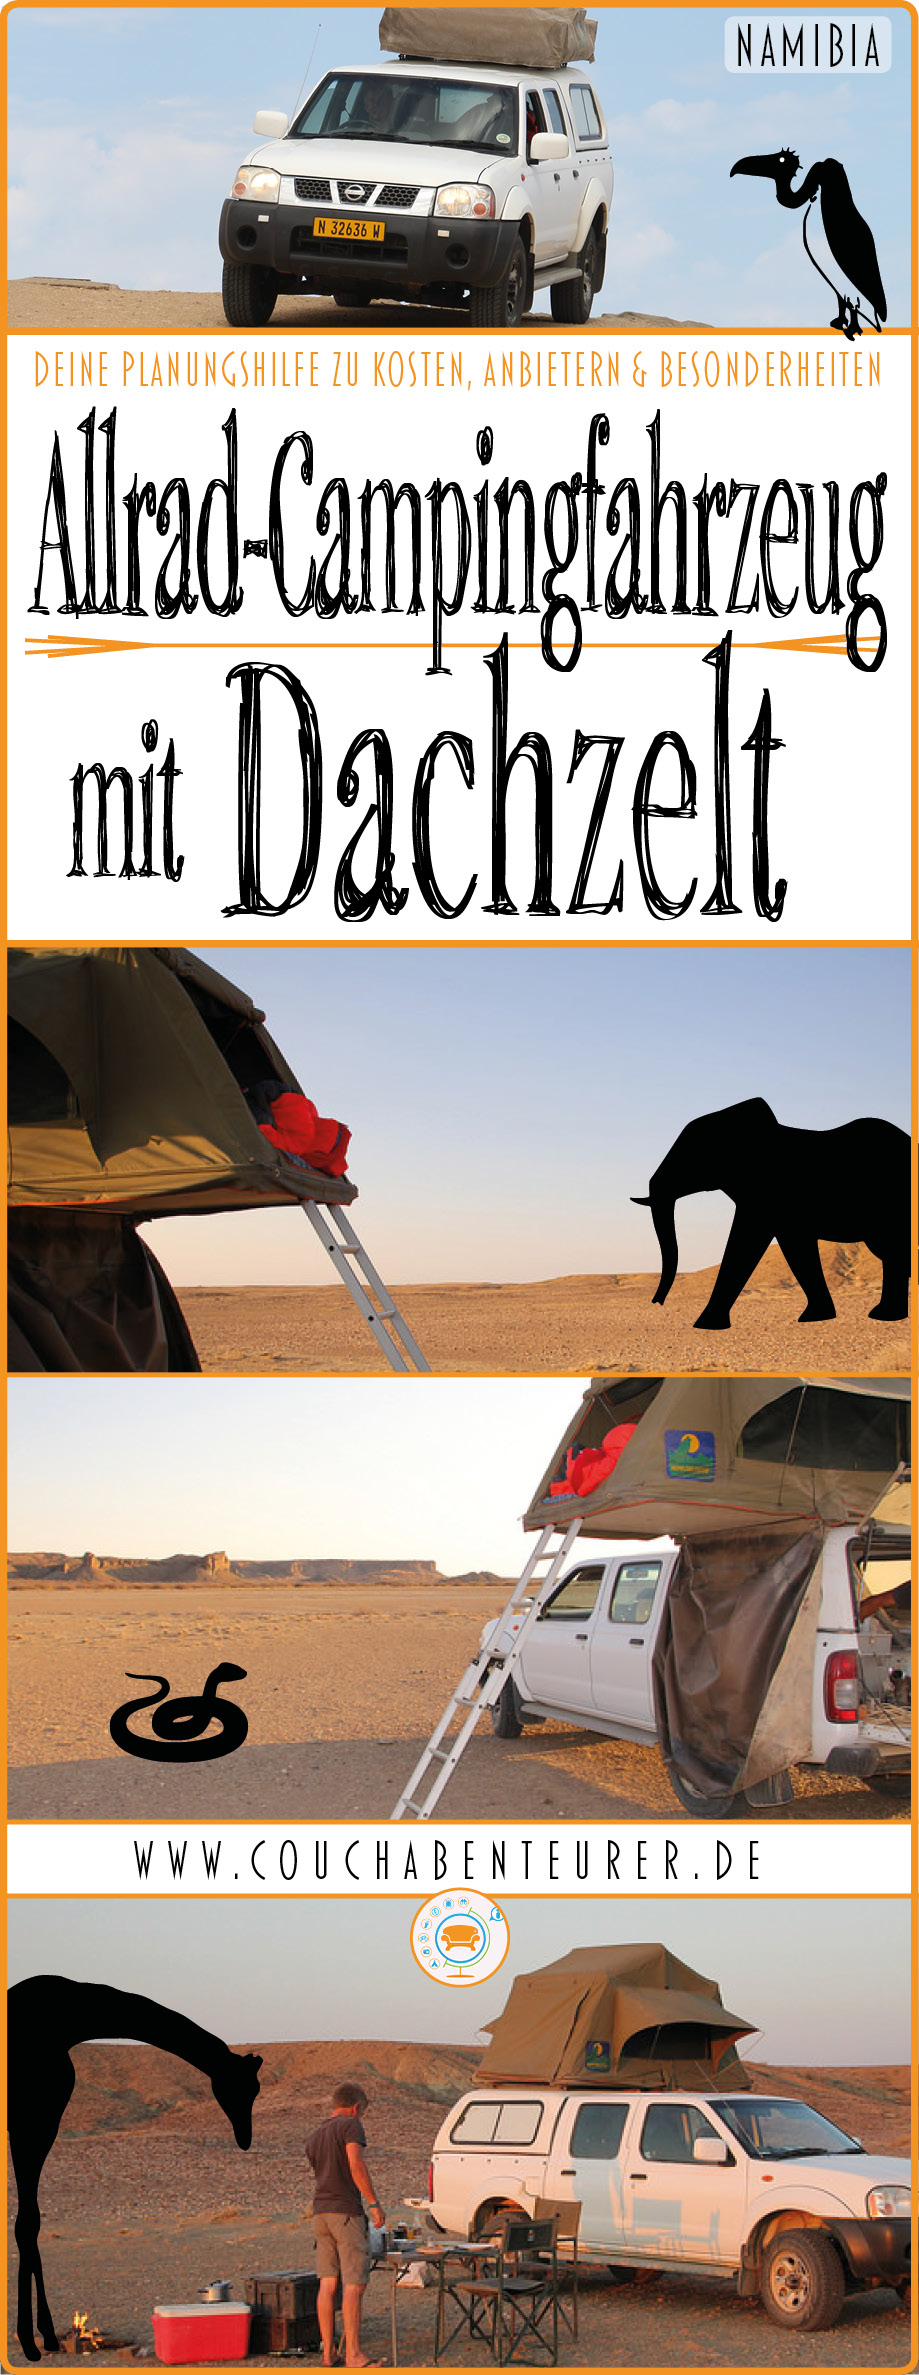 Namibia-Allrad-Campingfahrzeug-Dachzelt-Planungshilfe-Kosten-Anbietern-Besonderheiten